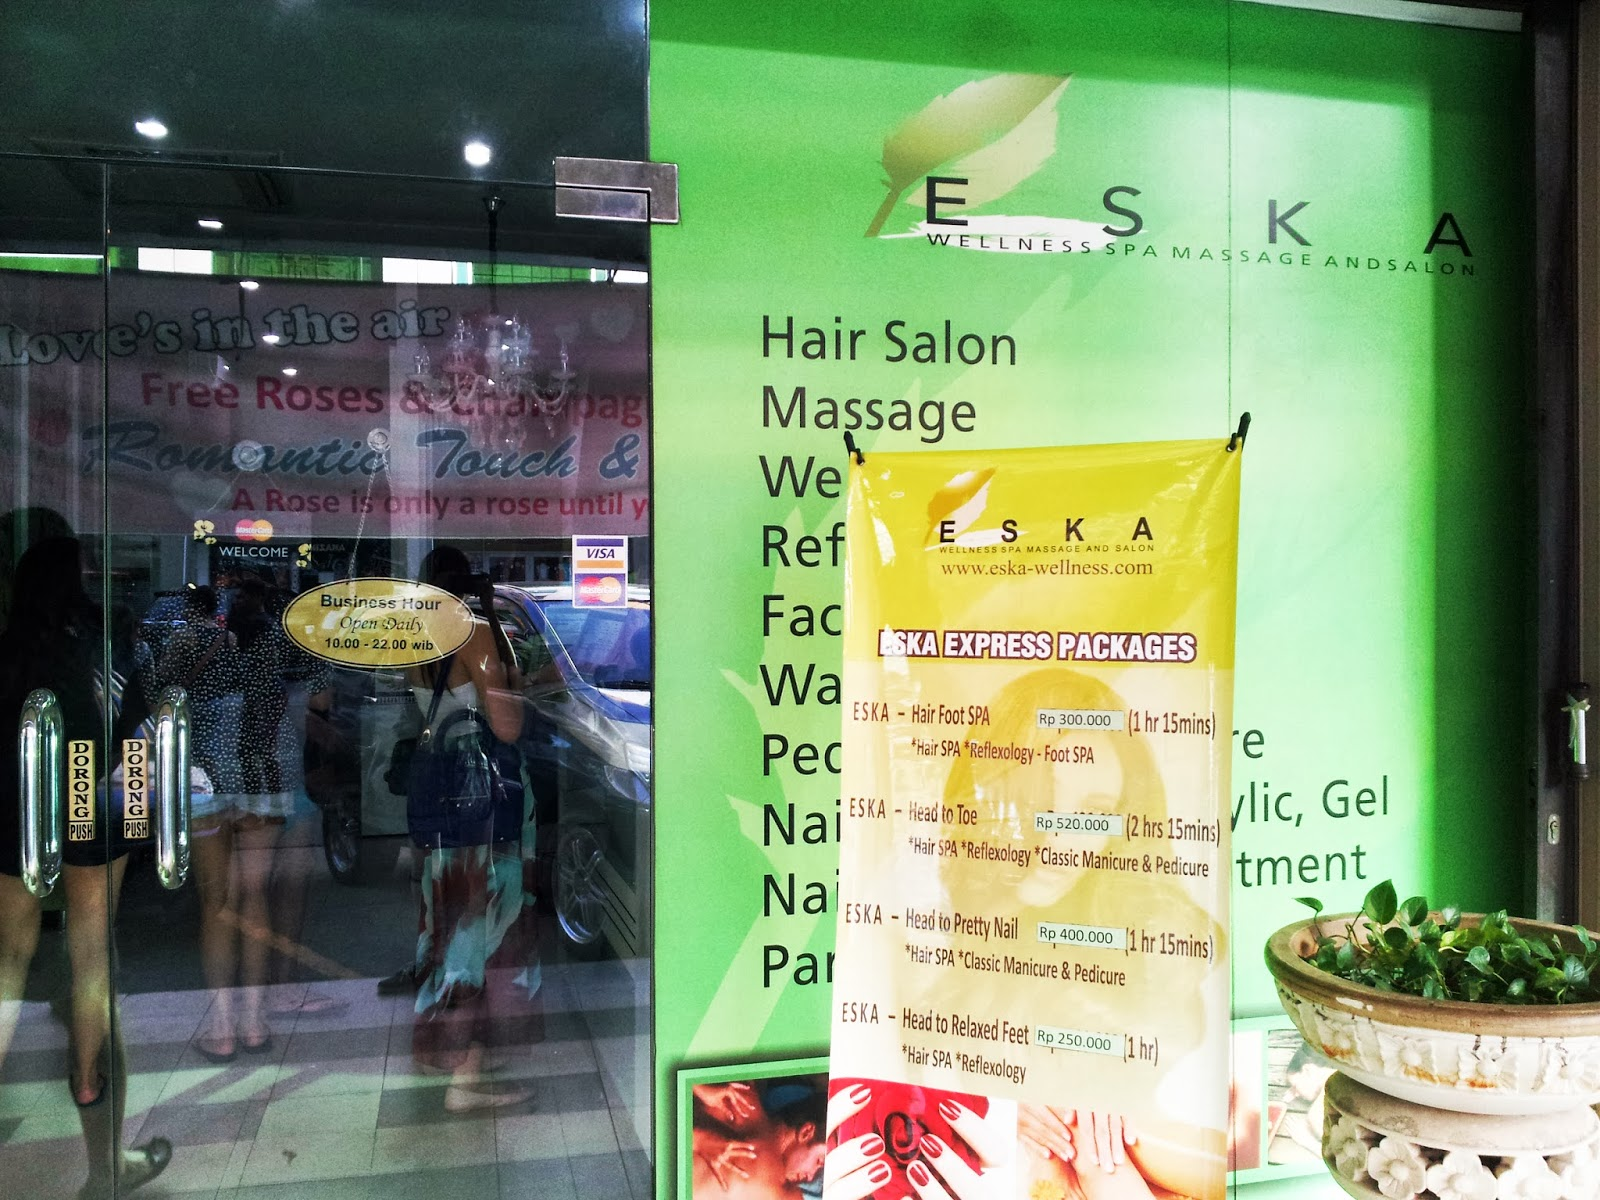 Eska Wellness Spa Massage and Salon (Batam) - Amie Hu | Food